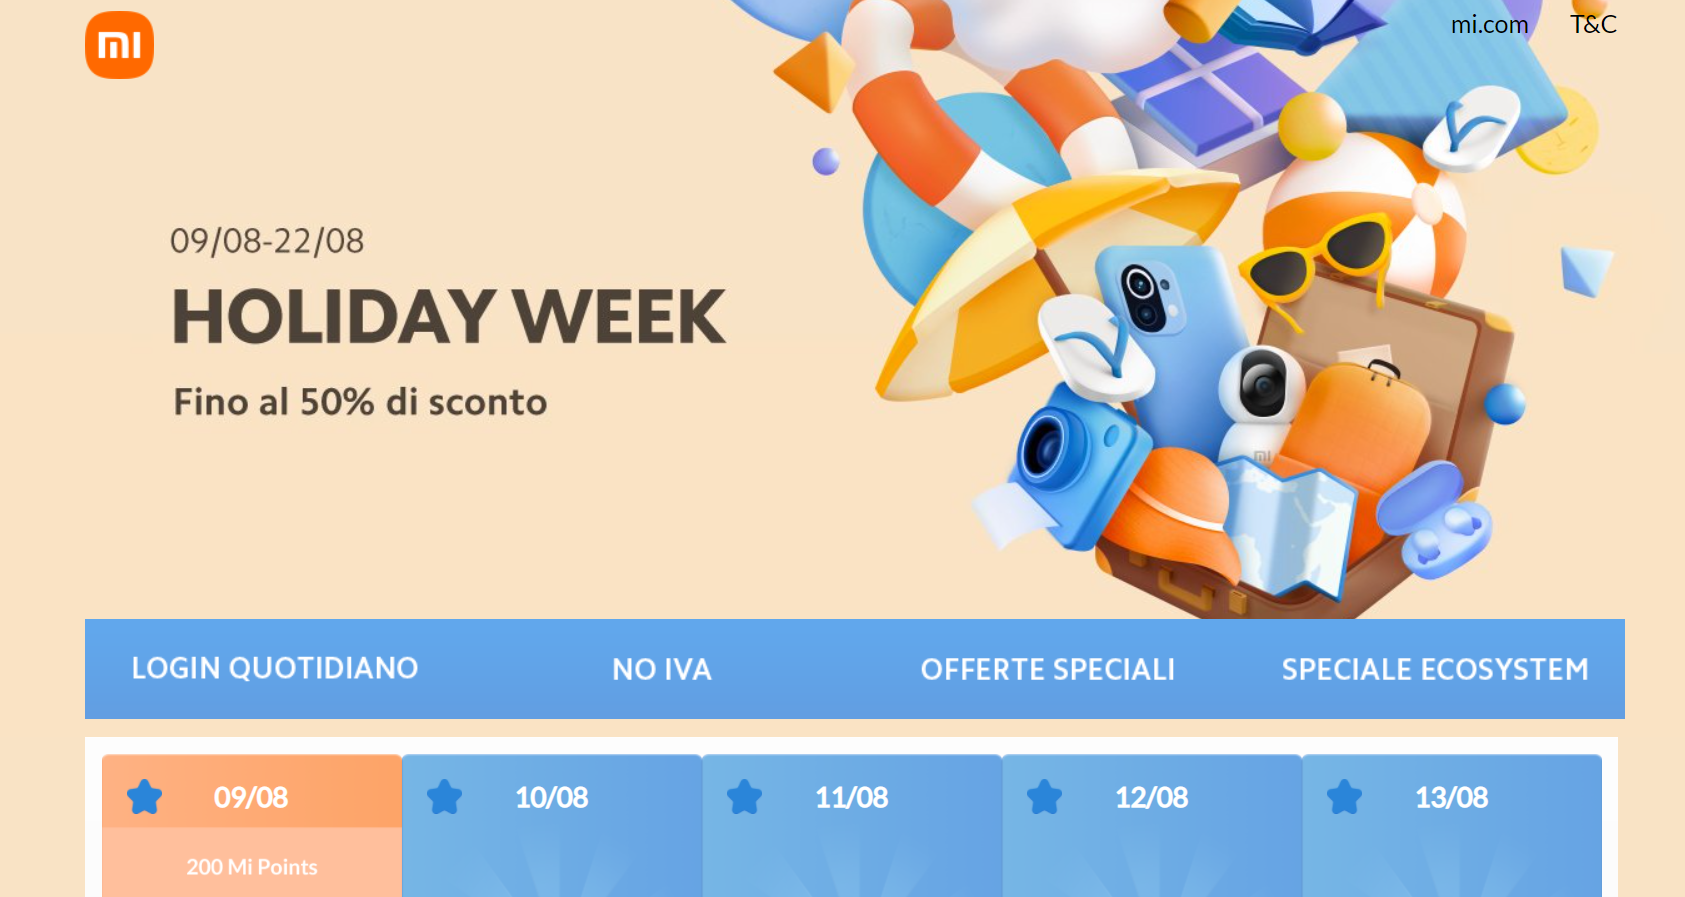 Offerte Holiday Week Xiaomi